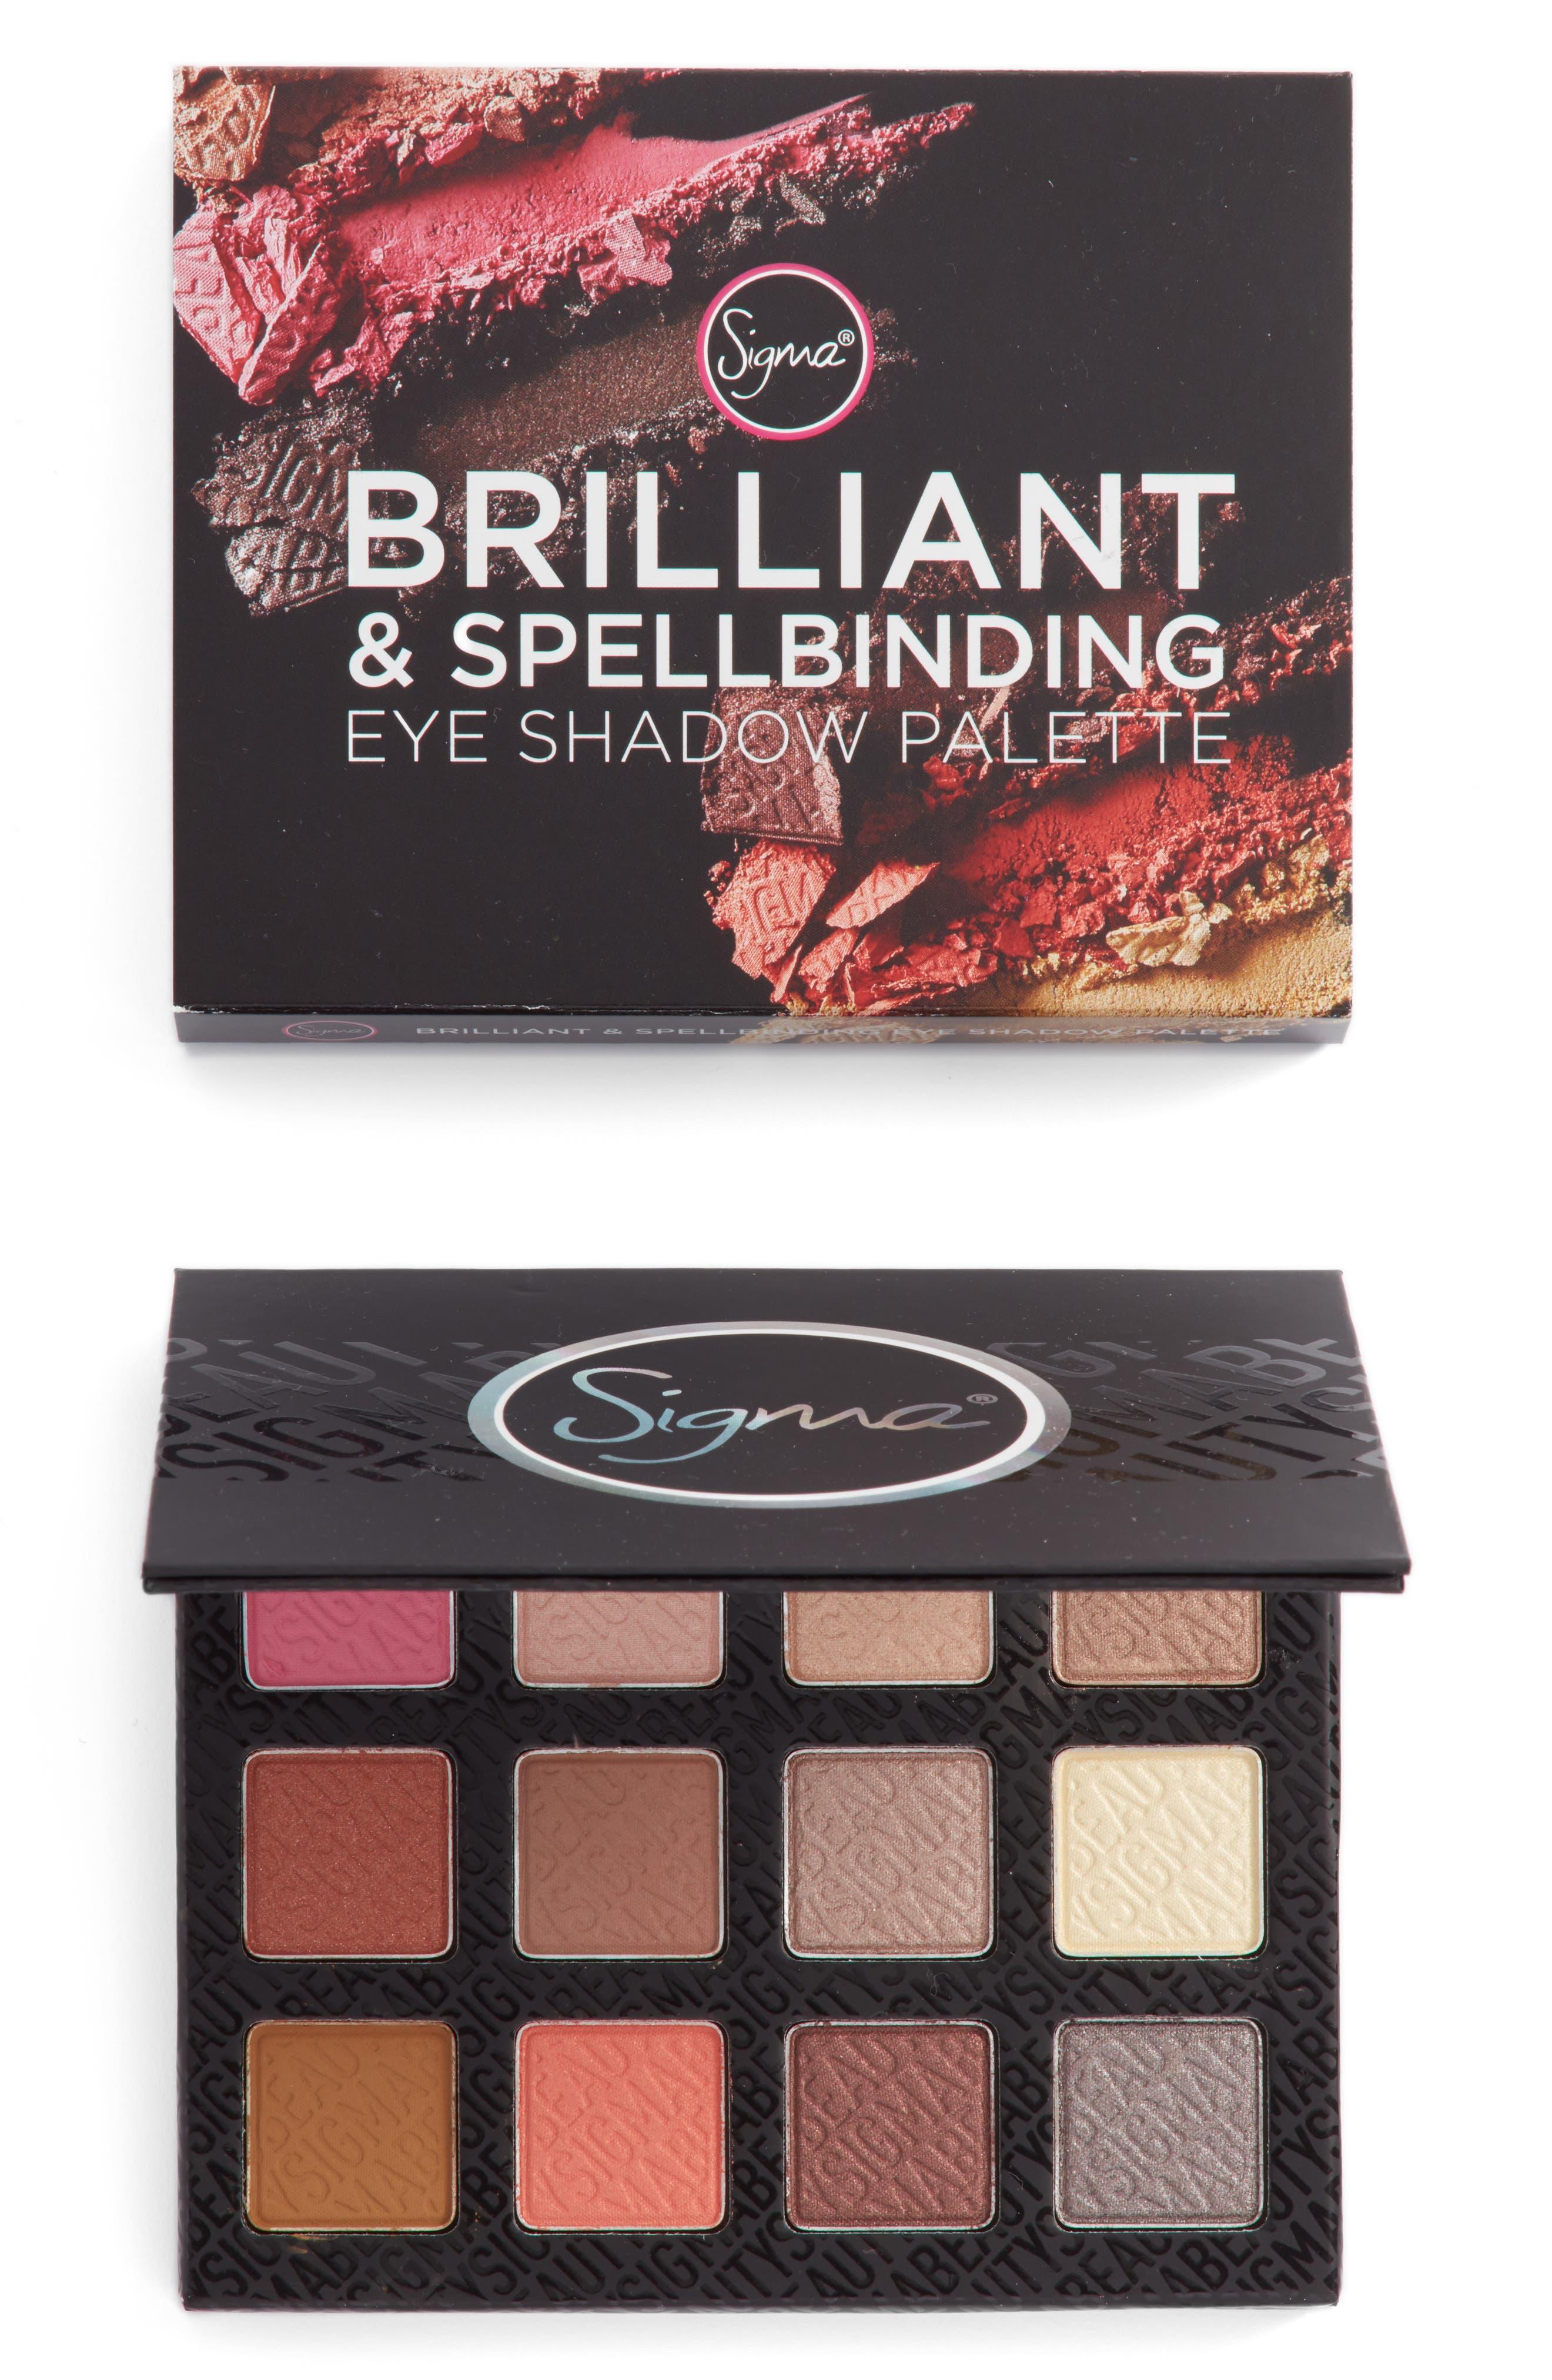 Alternate Image 1 Selected - Sigma Beauty Brilliant & Spellbinding Eyeshadow Palette ($39 Value)